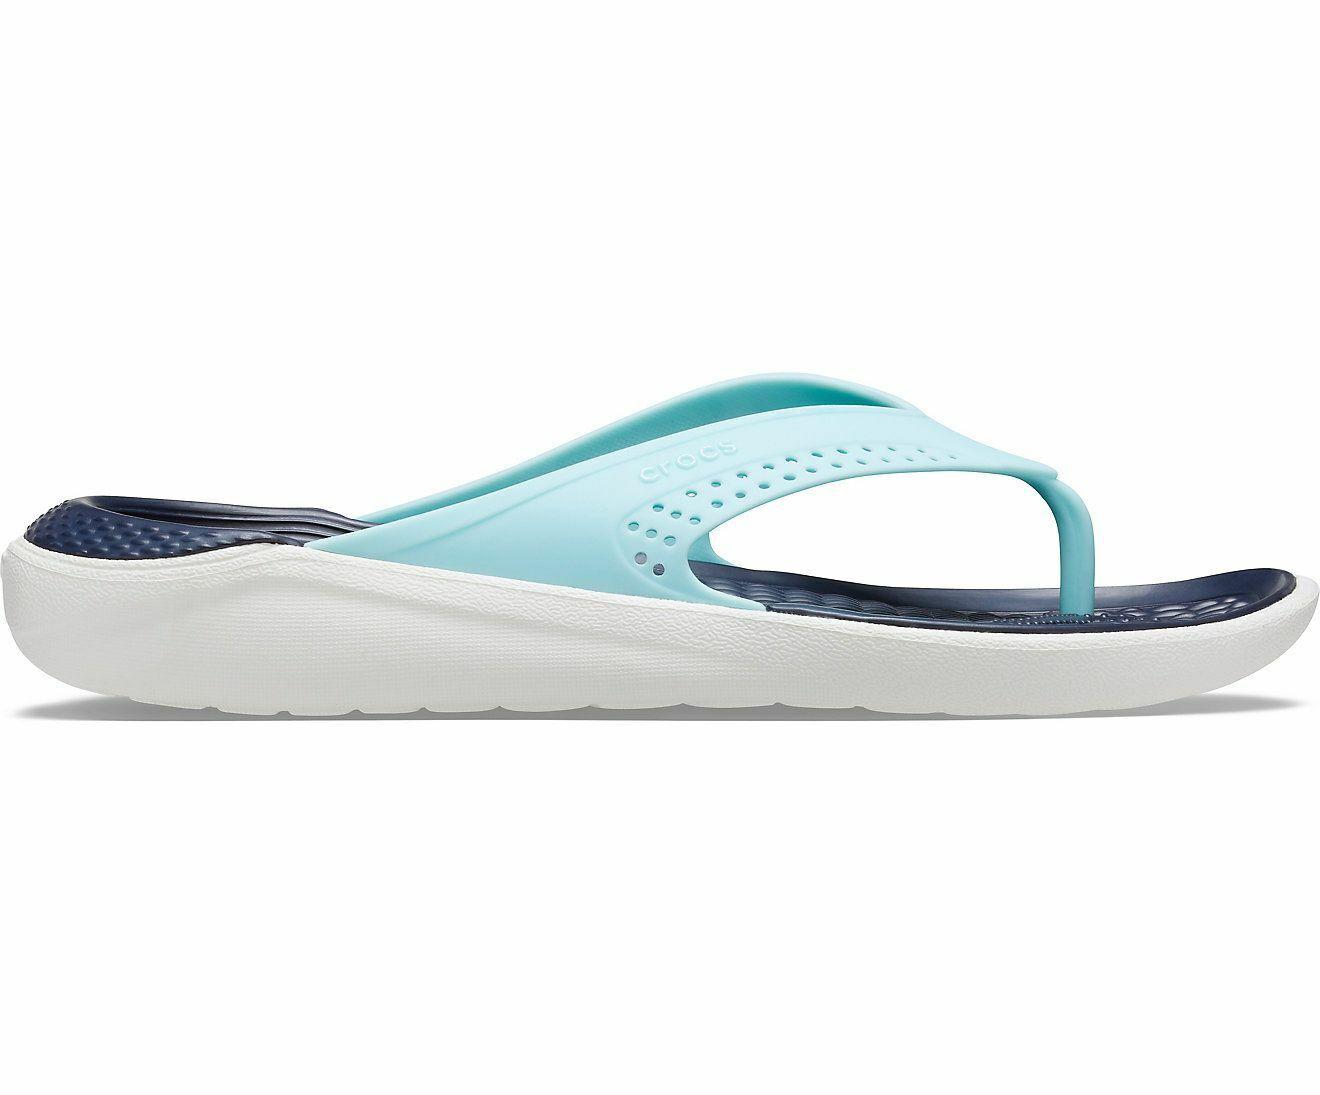 Details about  /Crocs LiteRide Flip Flop Sandals Lightweight Padded Summer Holiday Beach Unisex